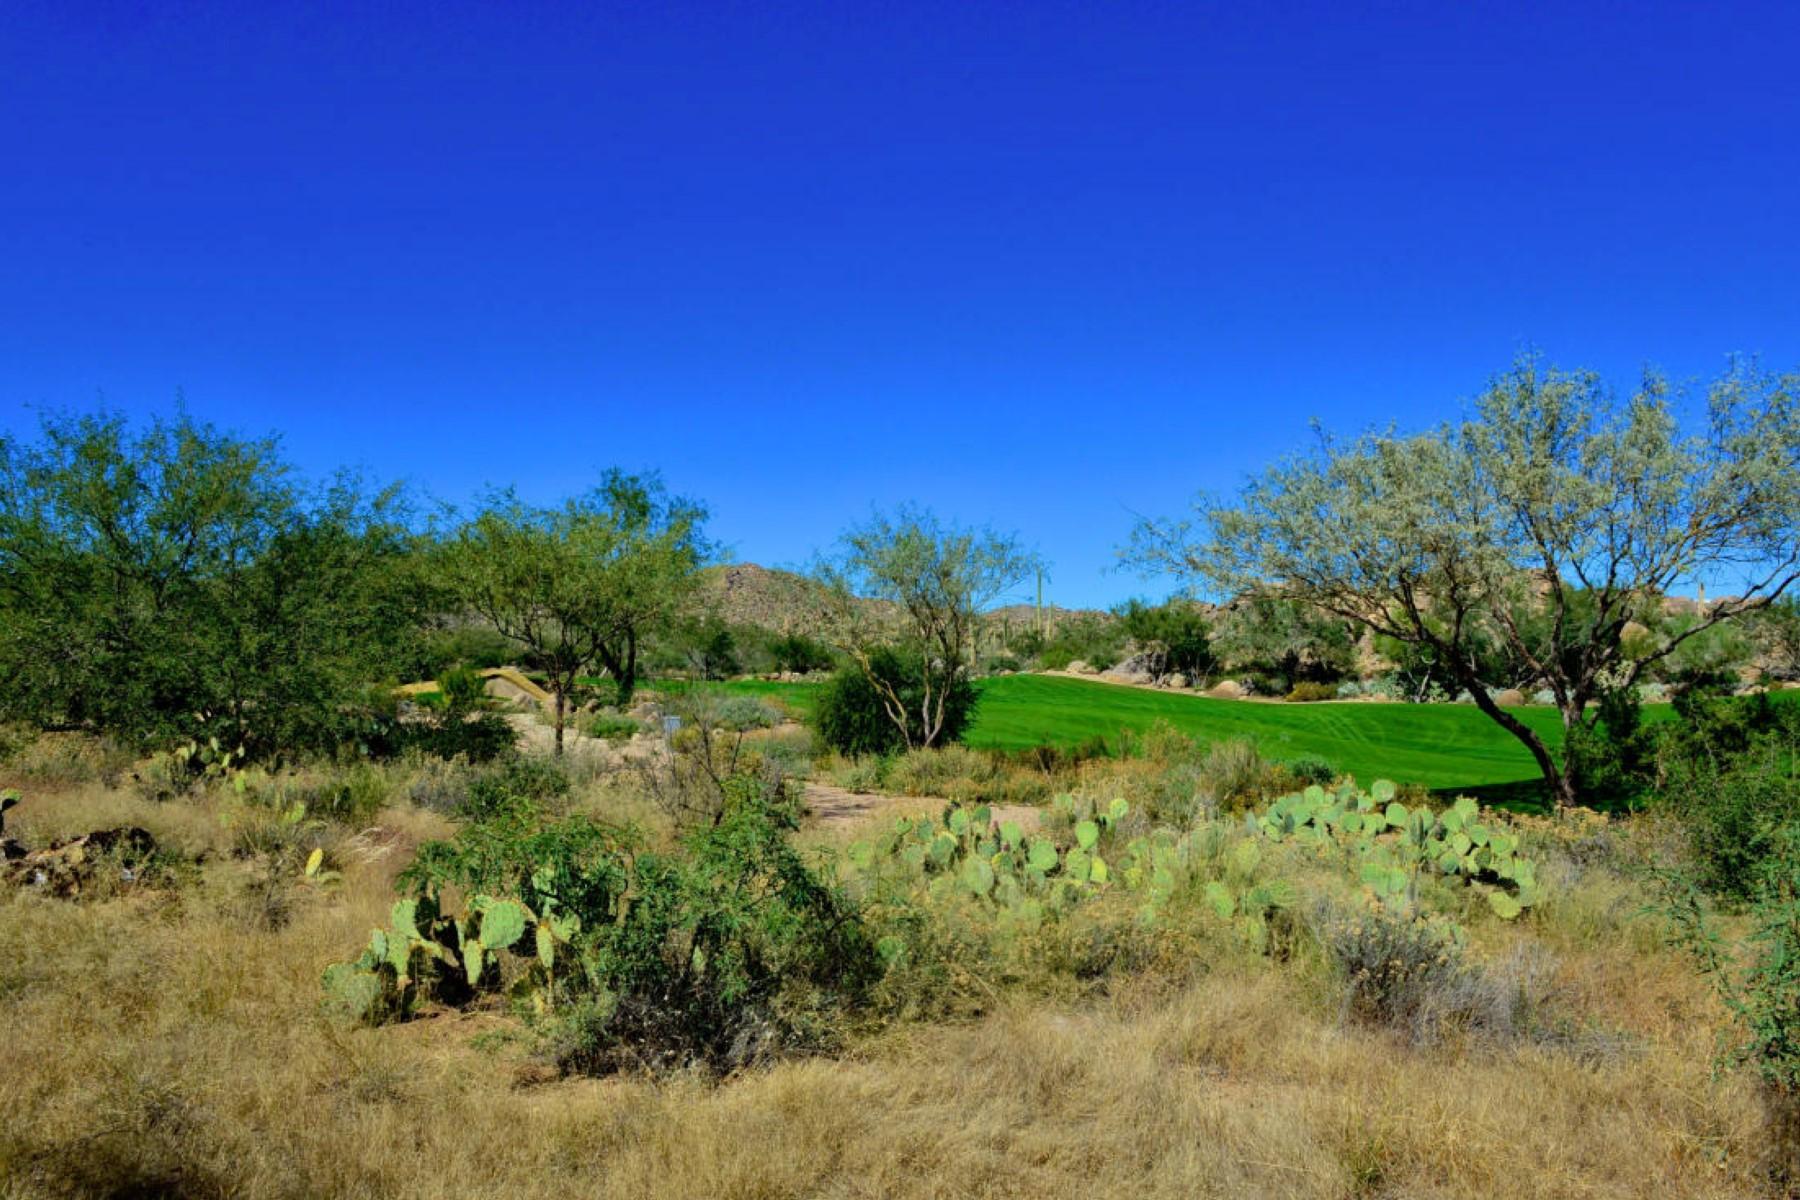 Land for Sale at Premium Corner Homesite With Golf Course, Tortolita & Catalina Mountain Views 754 W Granite Gorge Drive W #338 Oro Valley, Arizona 85755 United States